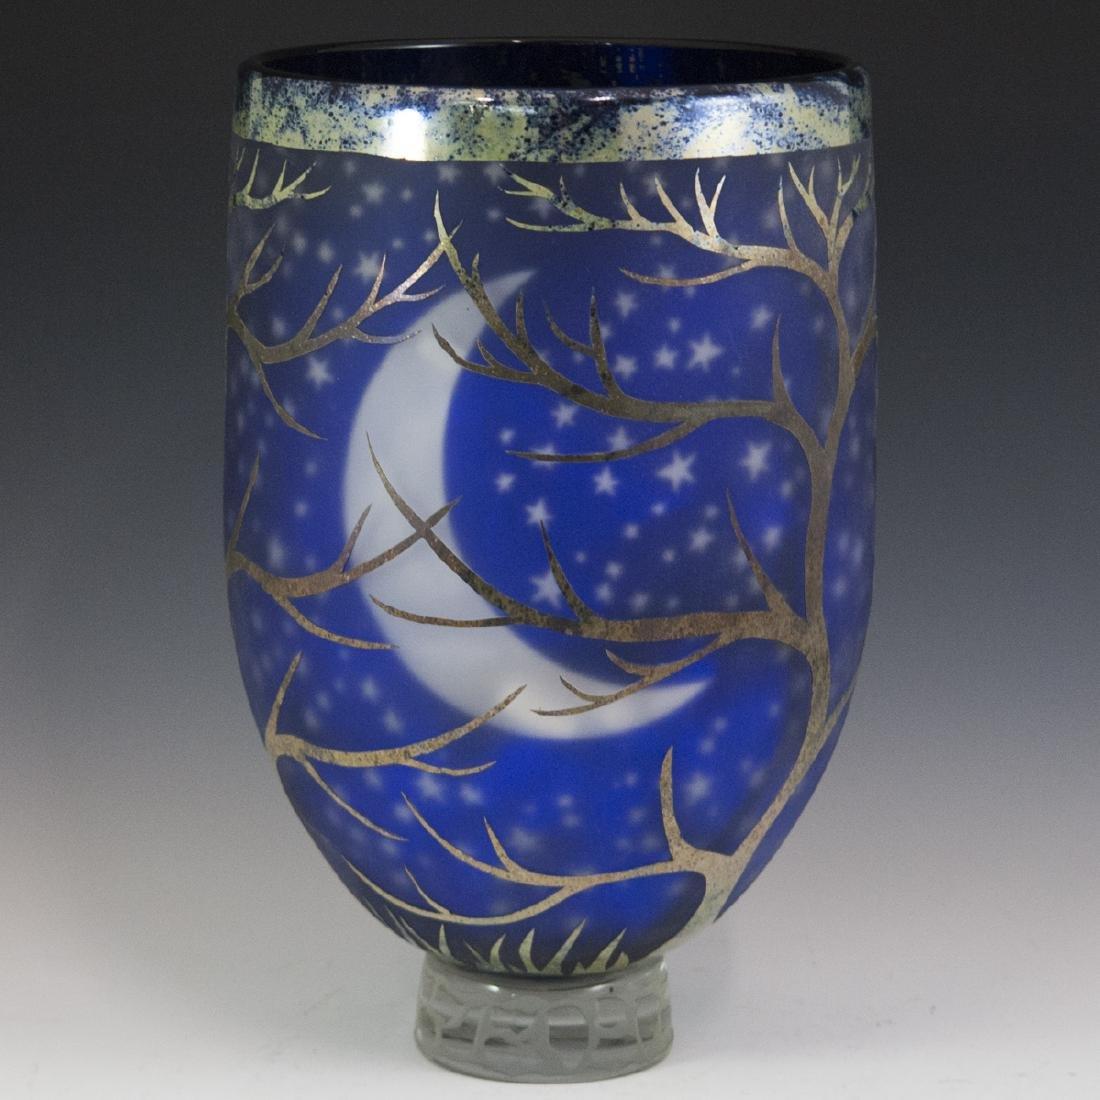 Large Duncan McClellan Art Glass Vase